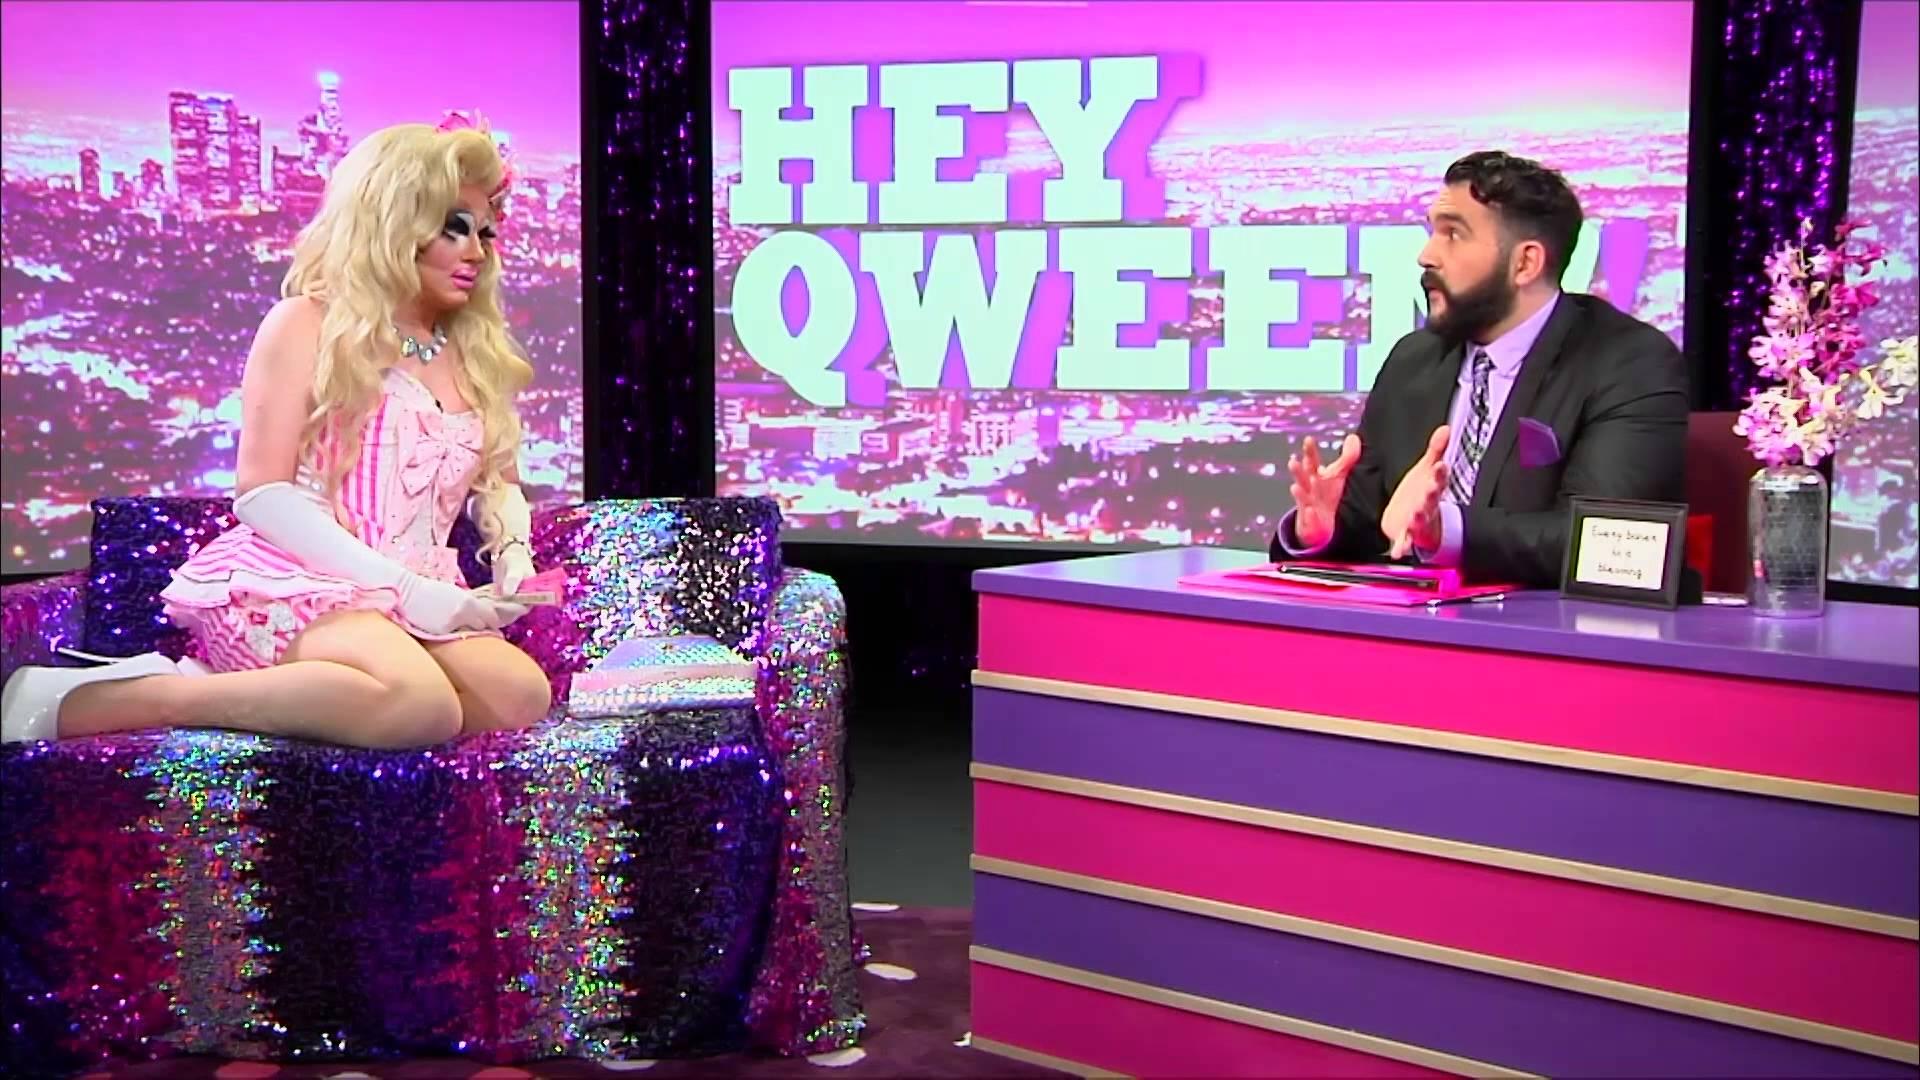 TS Madison's Advice To Trans Women: Hey Qween! Highlights